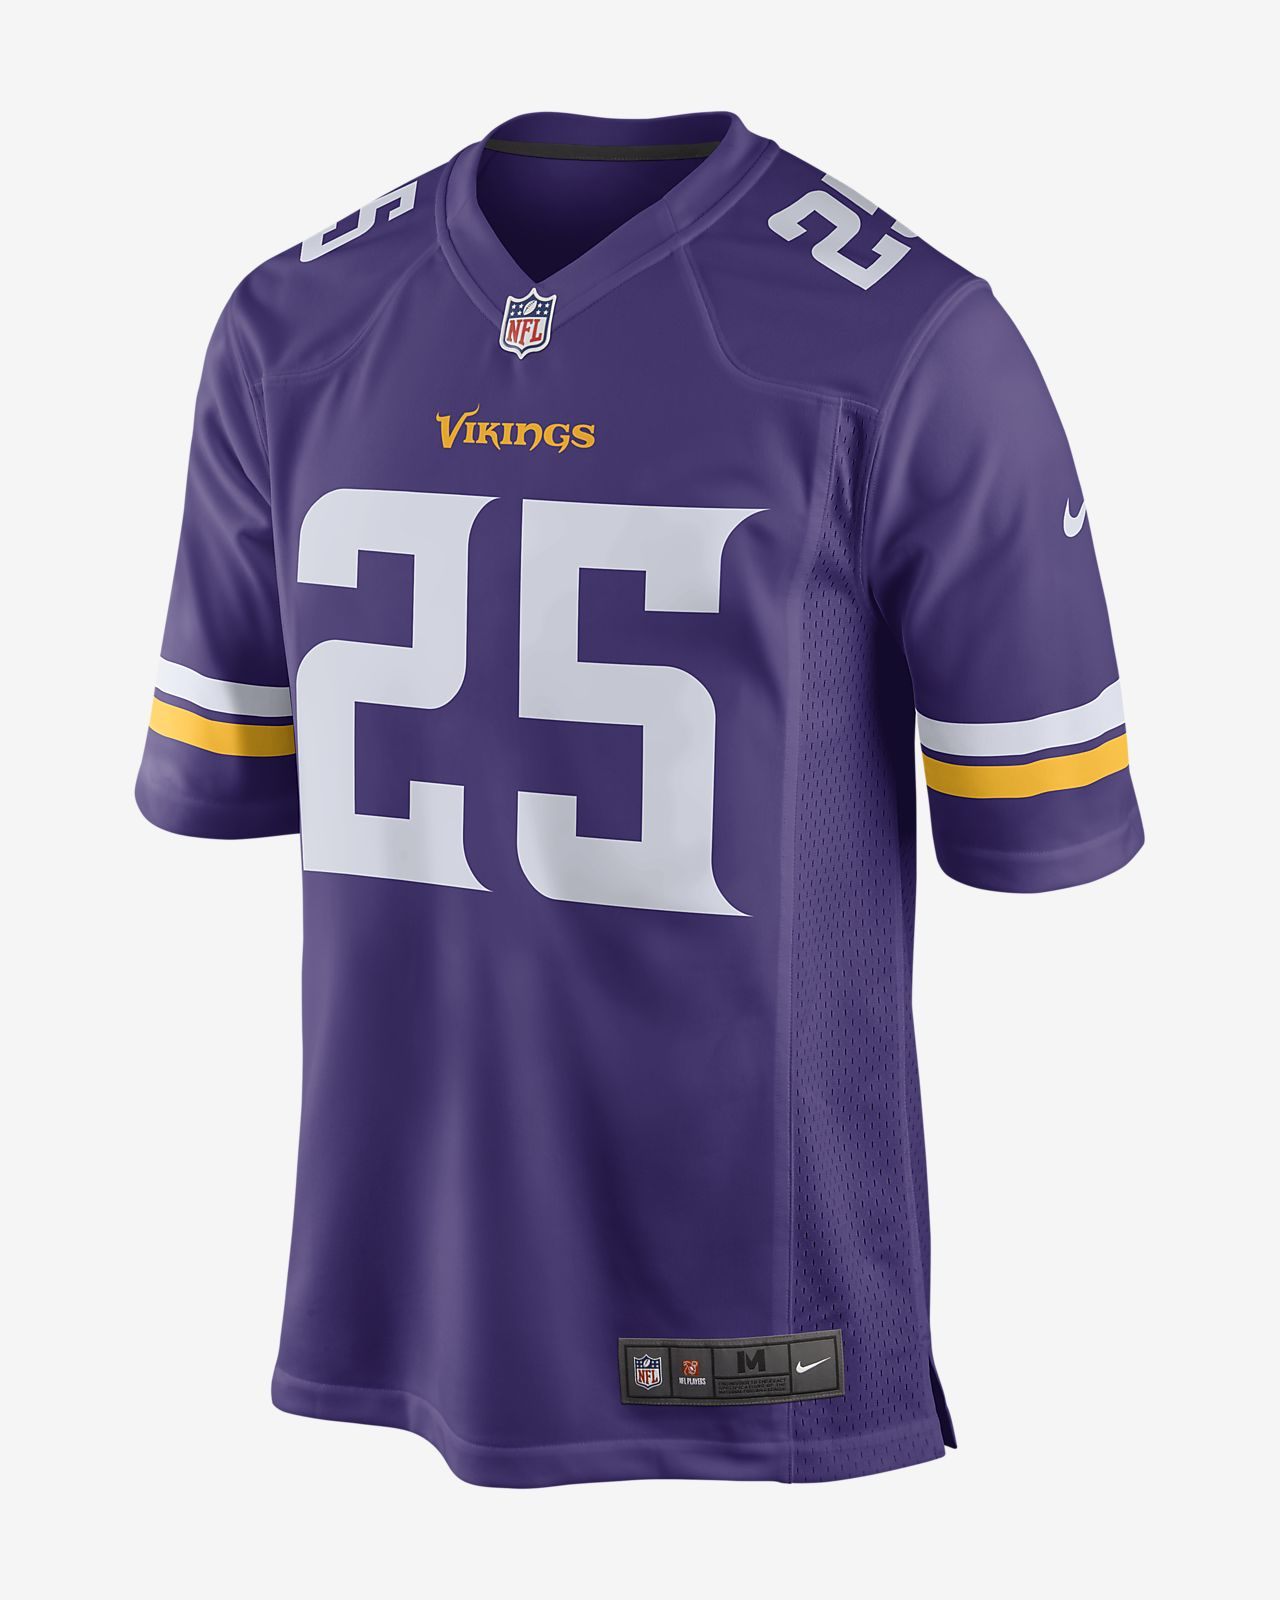 a988bfe5daad3 ... NFL Minnesota Vikings (Latavius Murray) Camiseta de fútbol americano de  la 1.ª